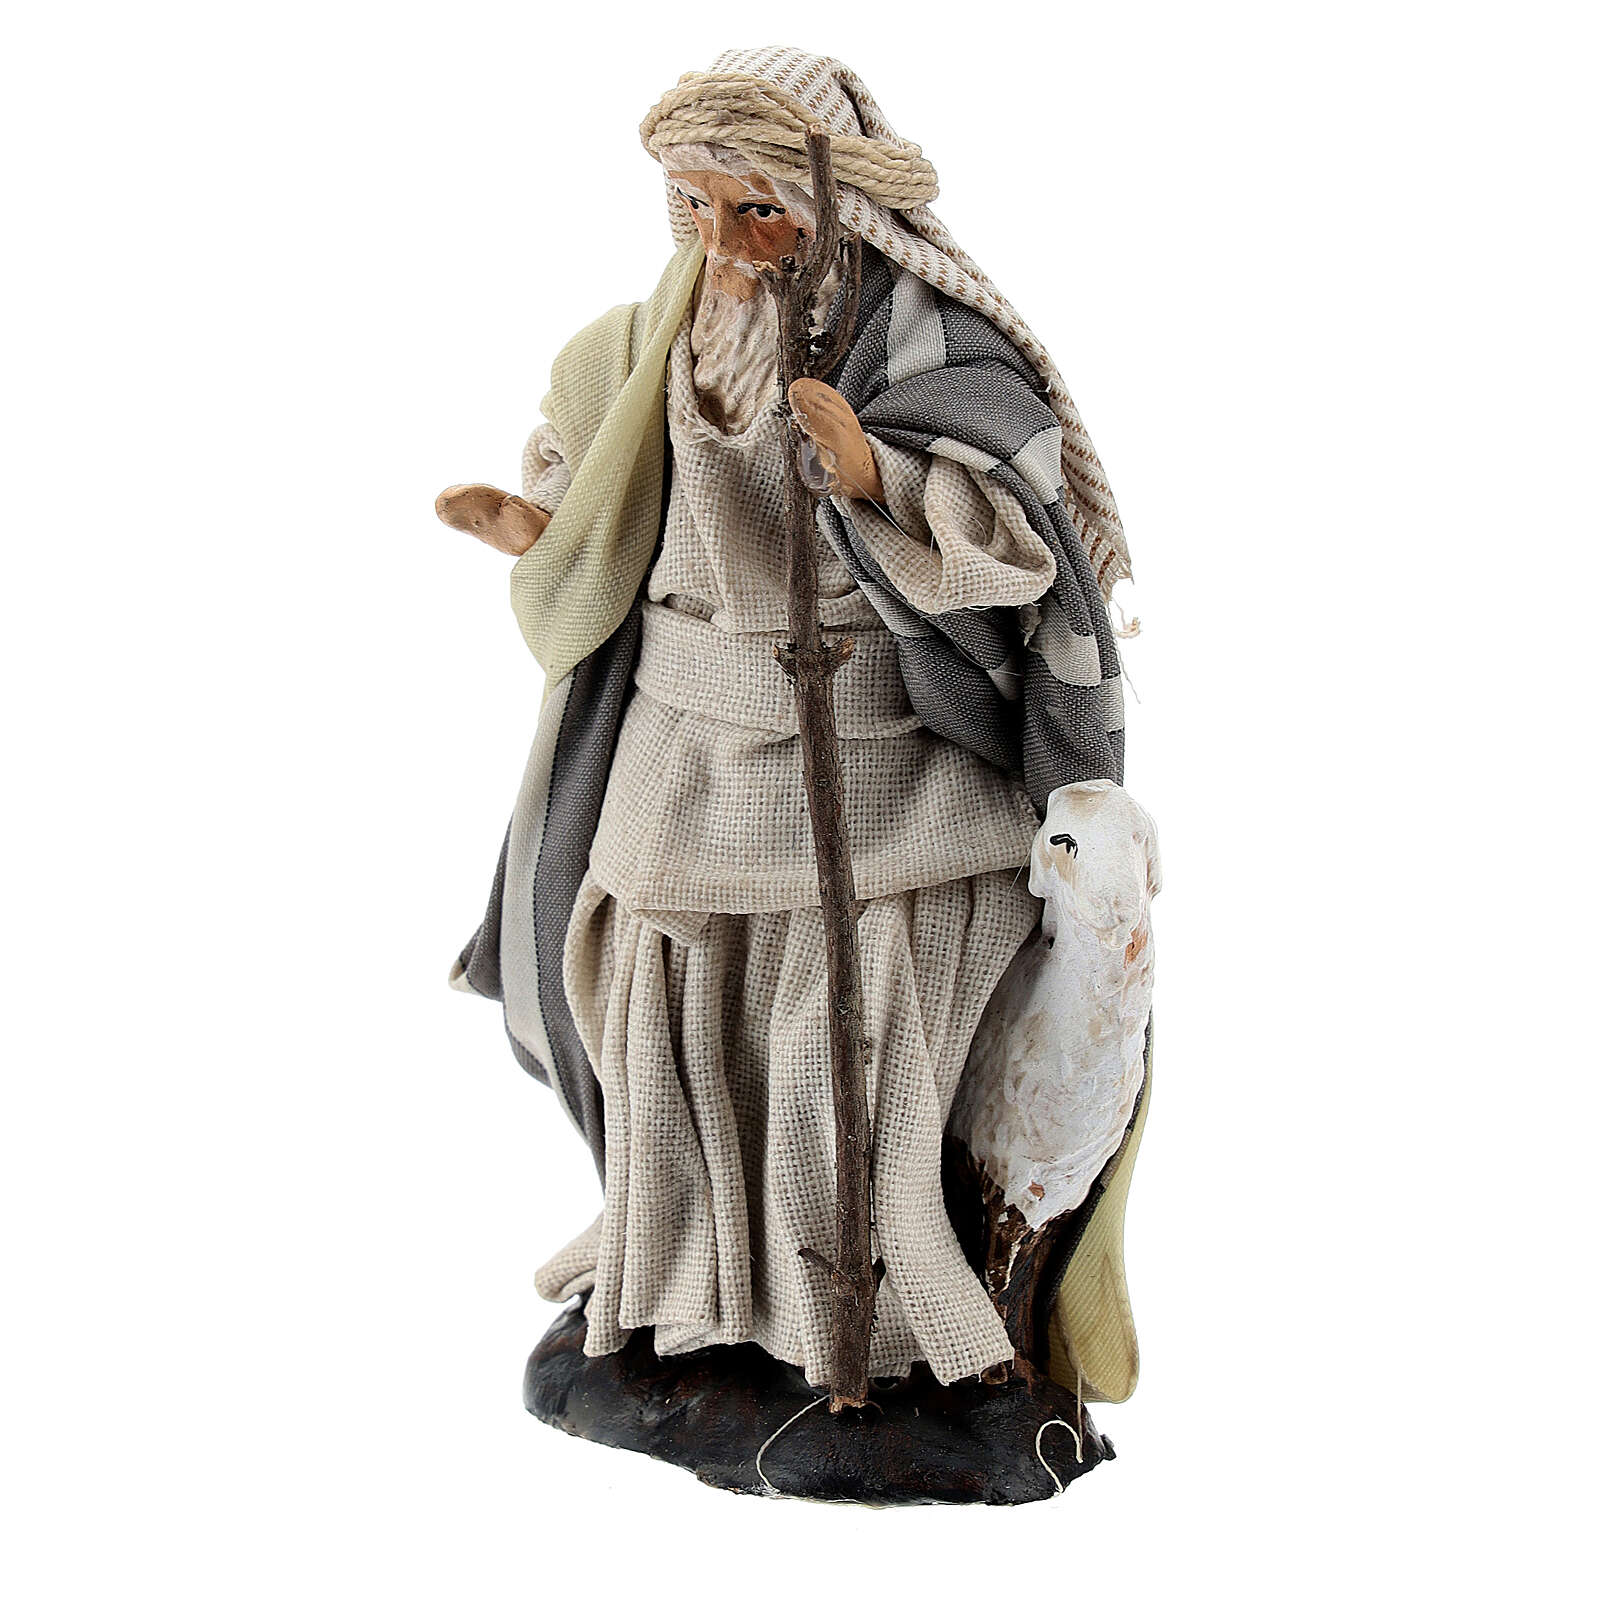 Shepherd with goat and stick, 8 cm Neapolitan nativity figurine 4